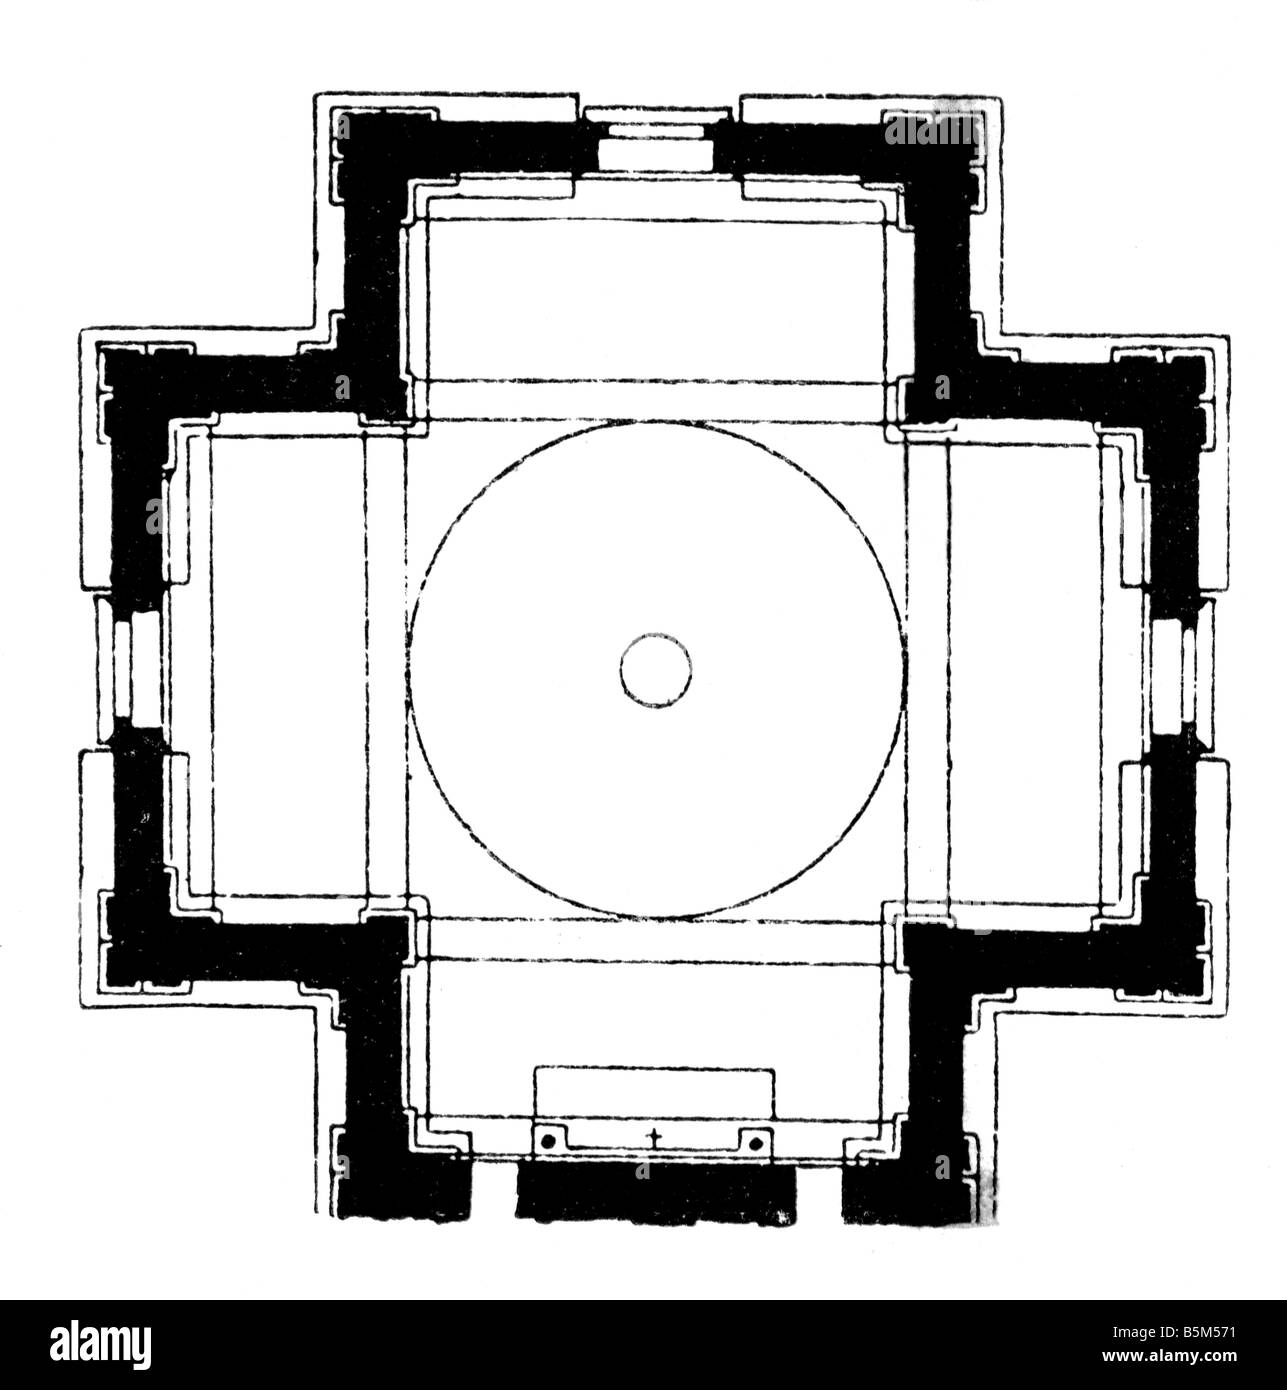 Basilica Floor Plan Architecture Floor Plans Santa Maria Delle Carceri